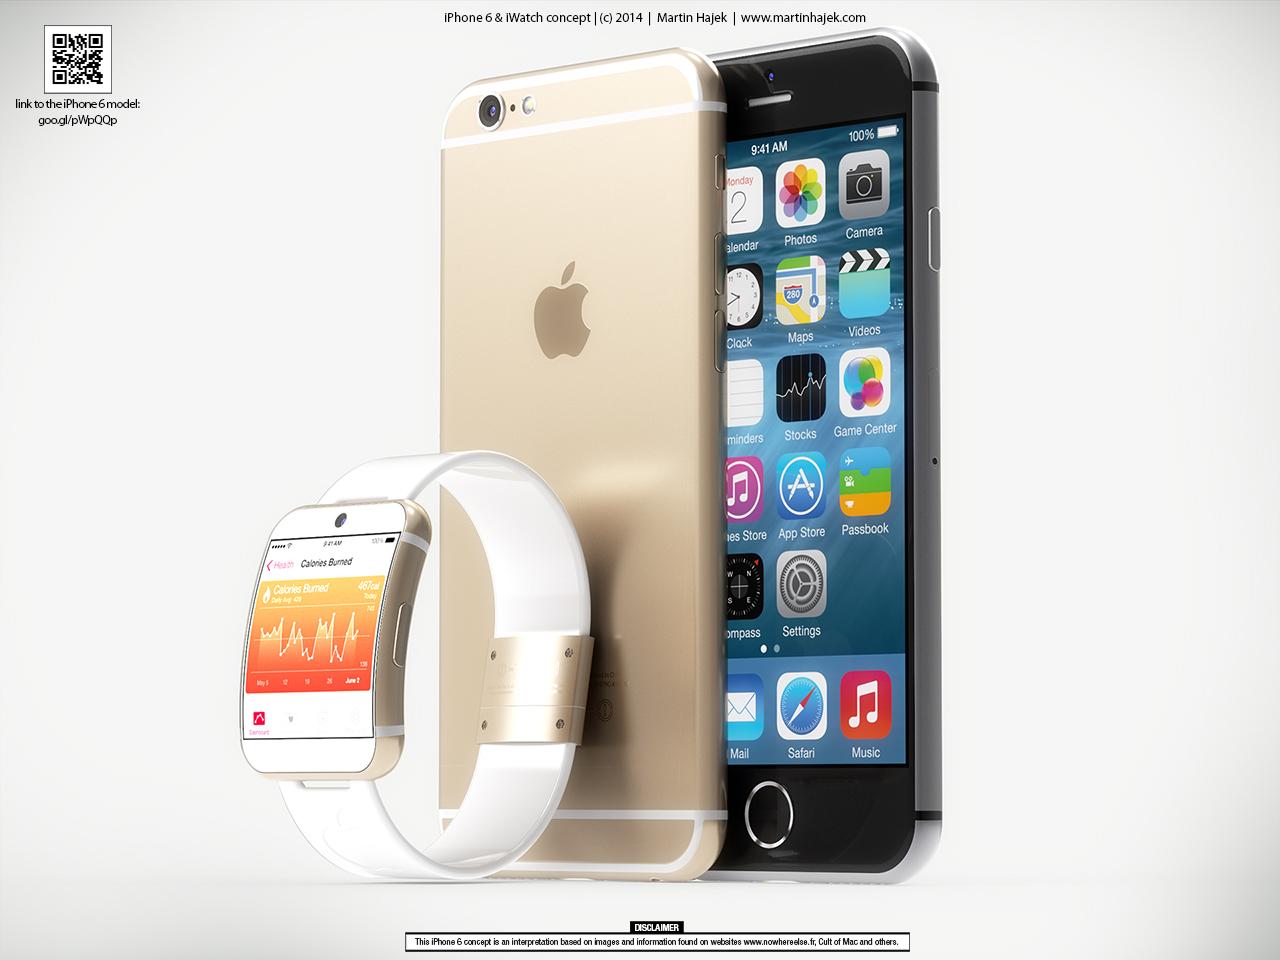 iphone6_iwatch_konzept6